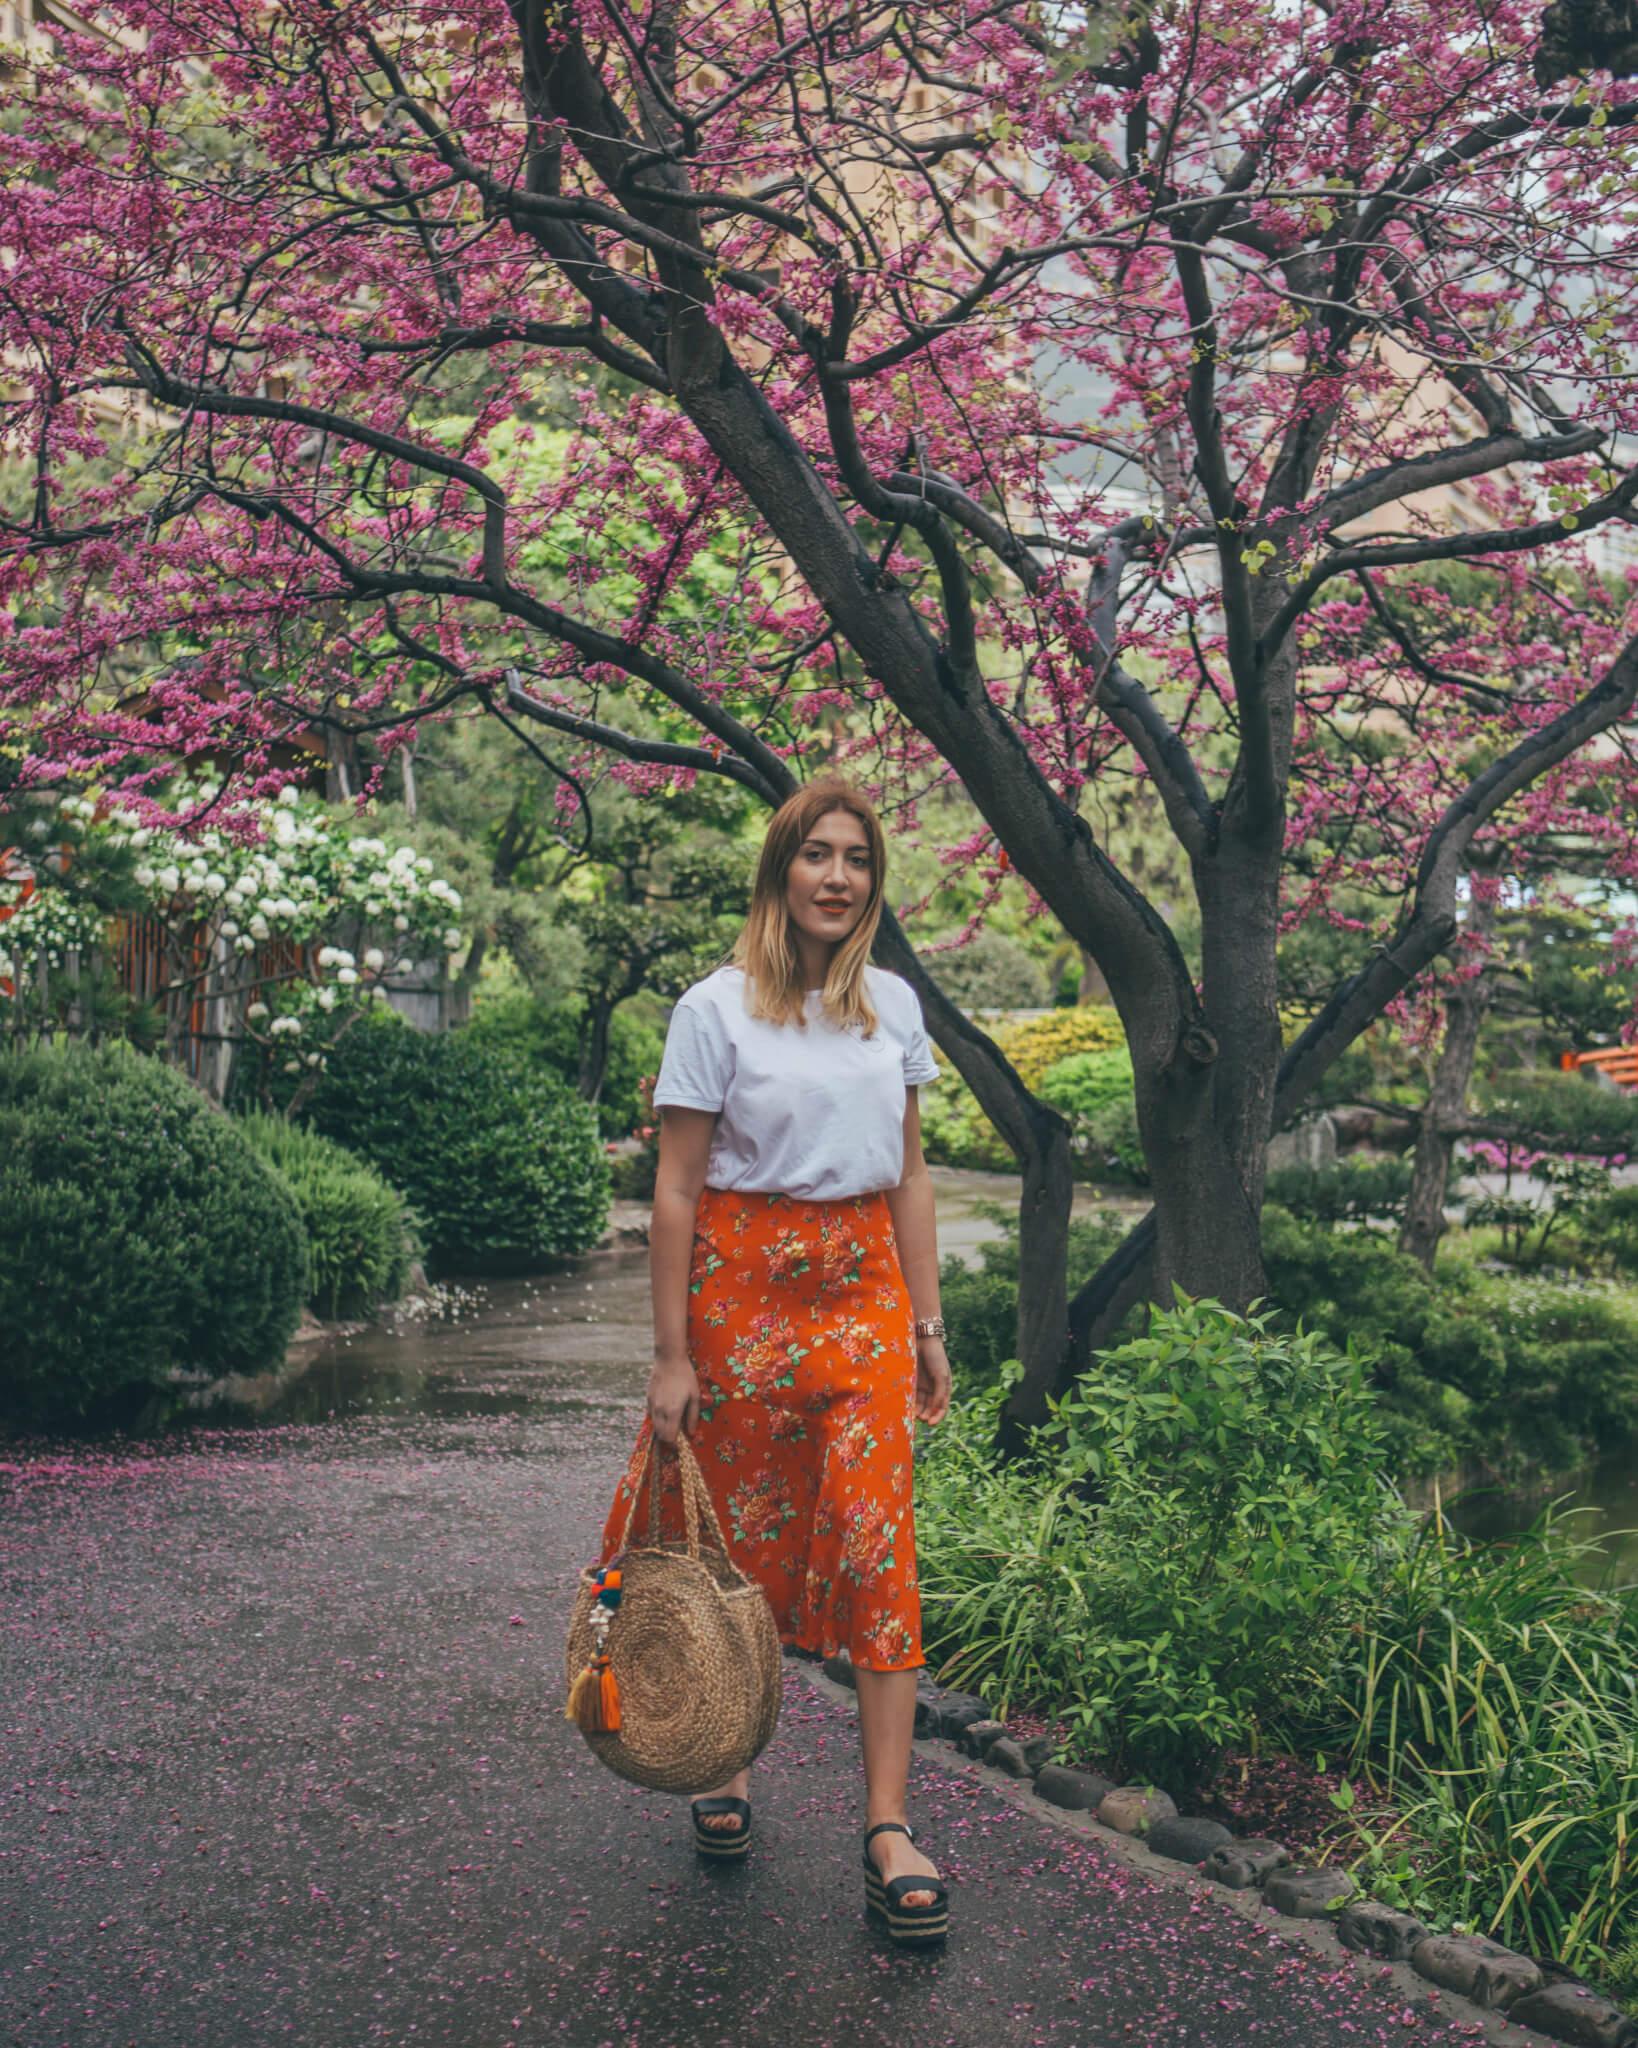 Japanese Garden Monaco - What I Wore